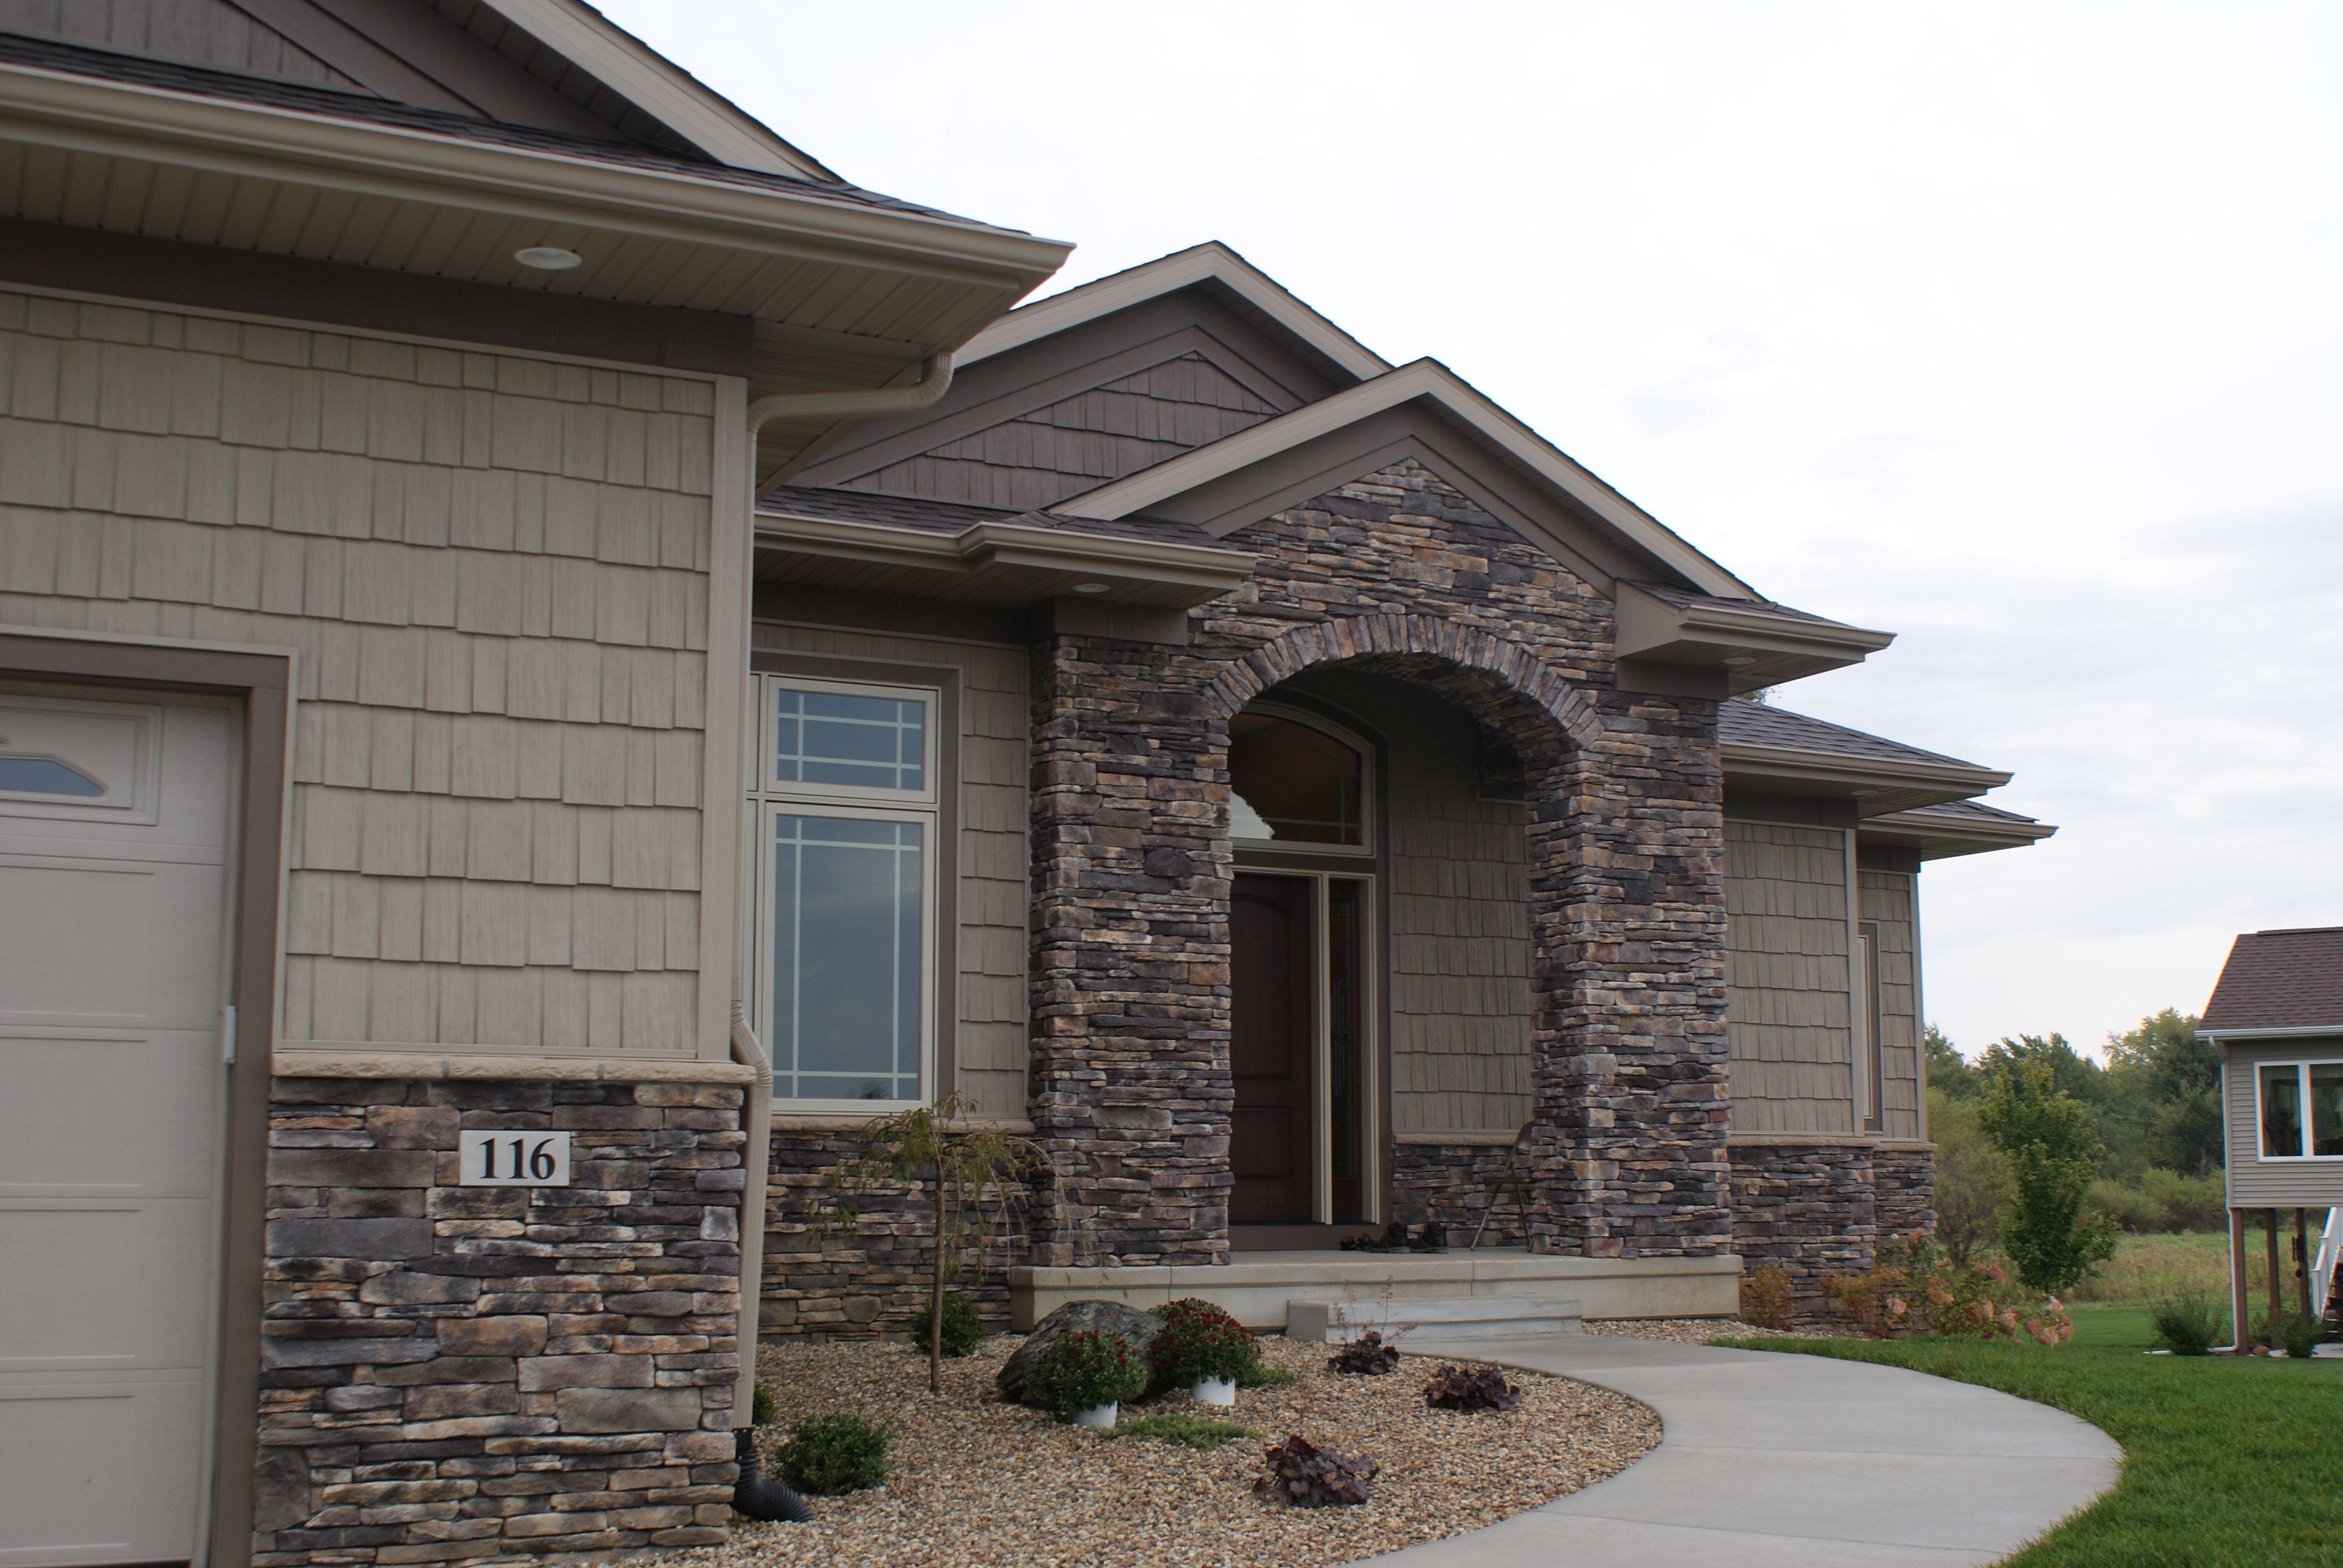 Winterhaven Pro Fit Alpine Ledgestone Cultured Stone Stone Boral Usa White Stone Veneer Facade House Stone Veneer Exterior Brick Siding